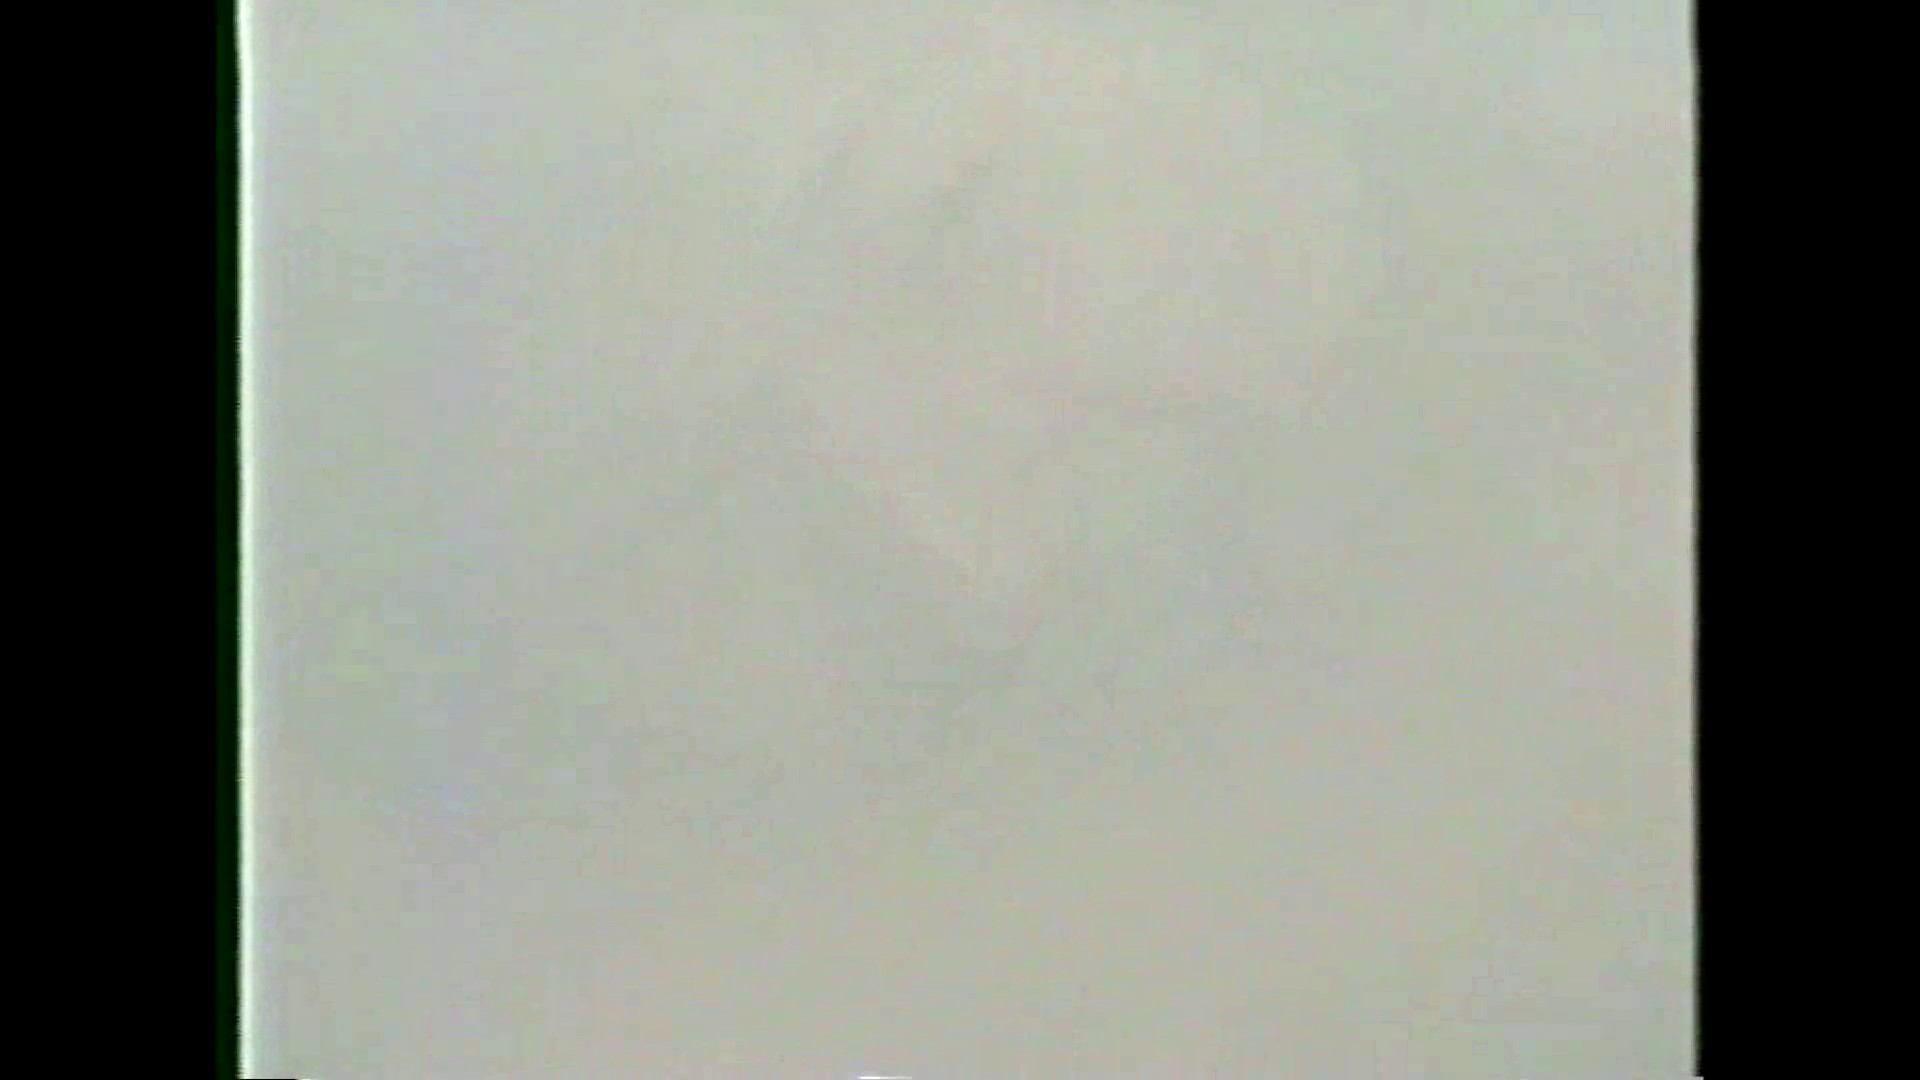 GAYBOY宏のオカズ倉庫Vol.3-4 ゲイのシックスナイン ゲイ無料エロ画像 91pic 8